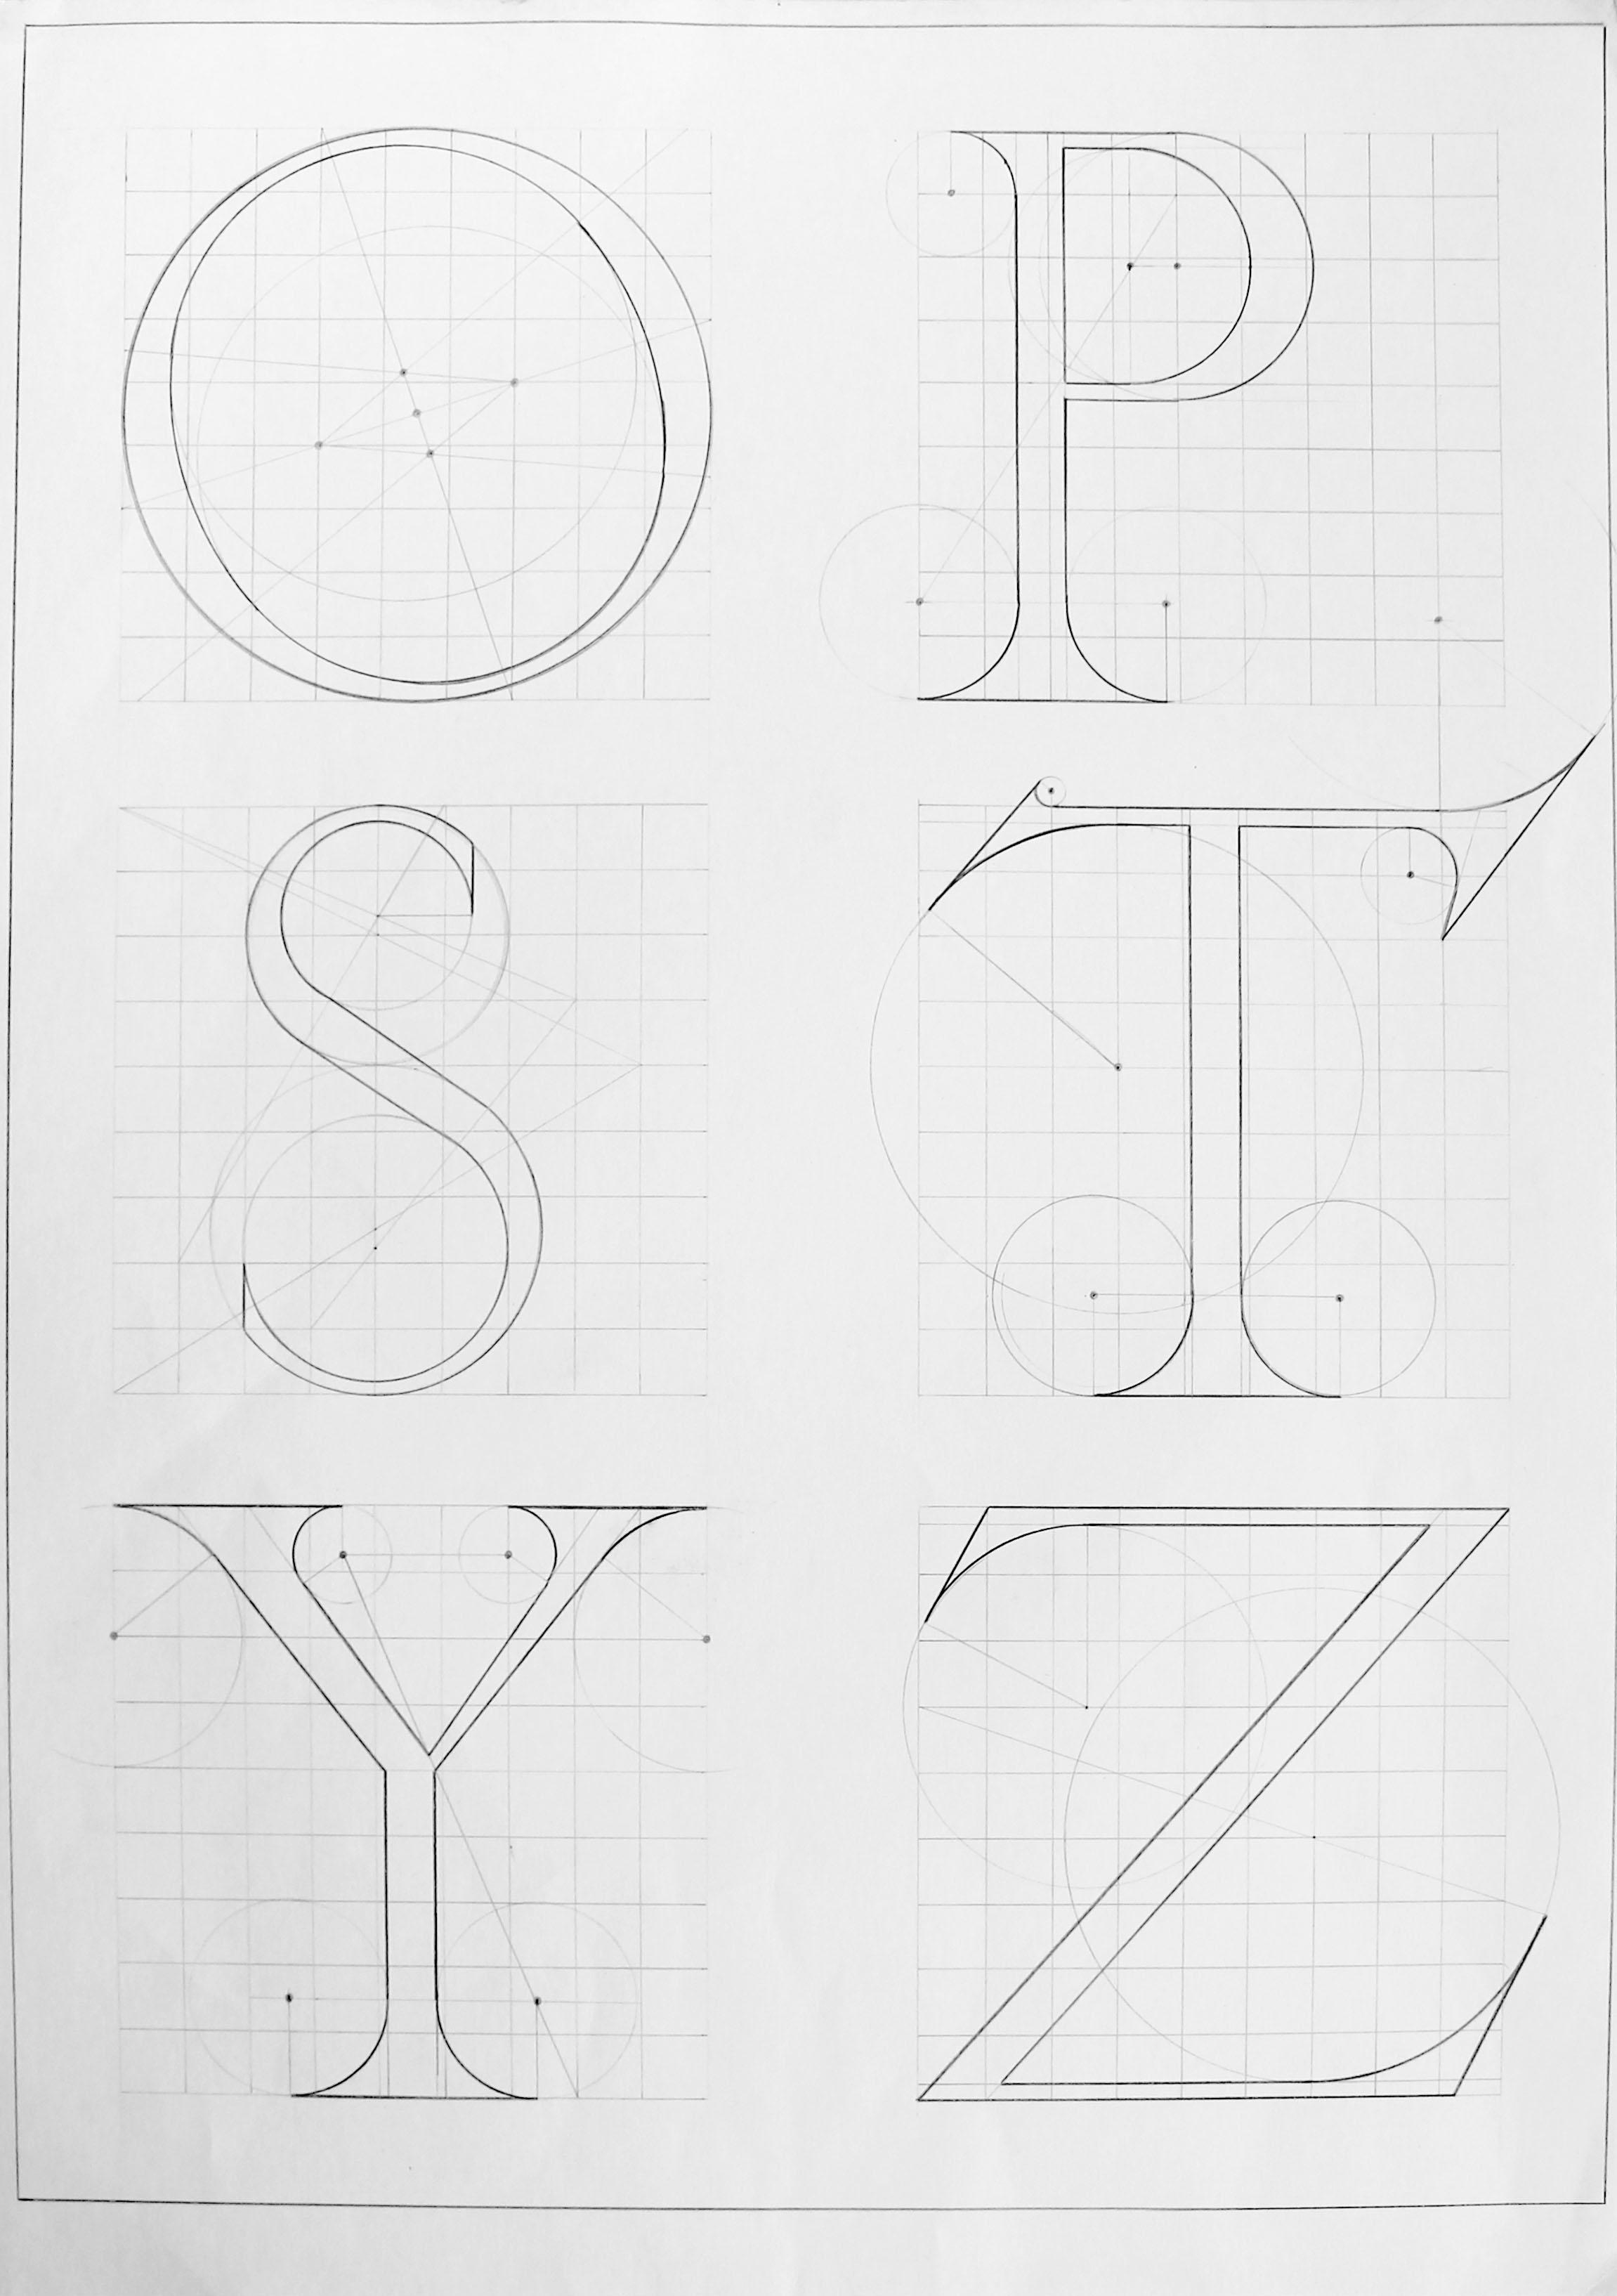 Латинский алфавит Альберти